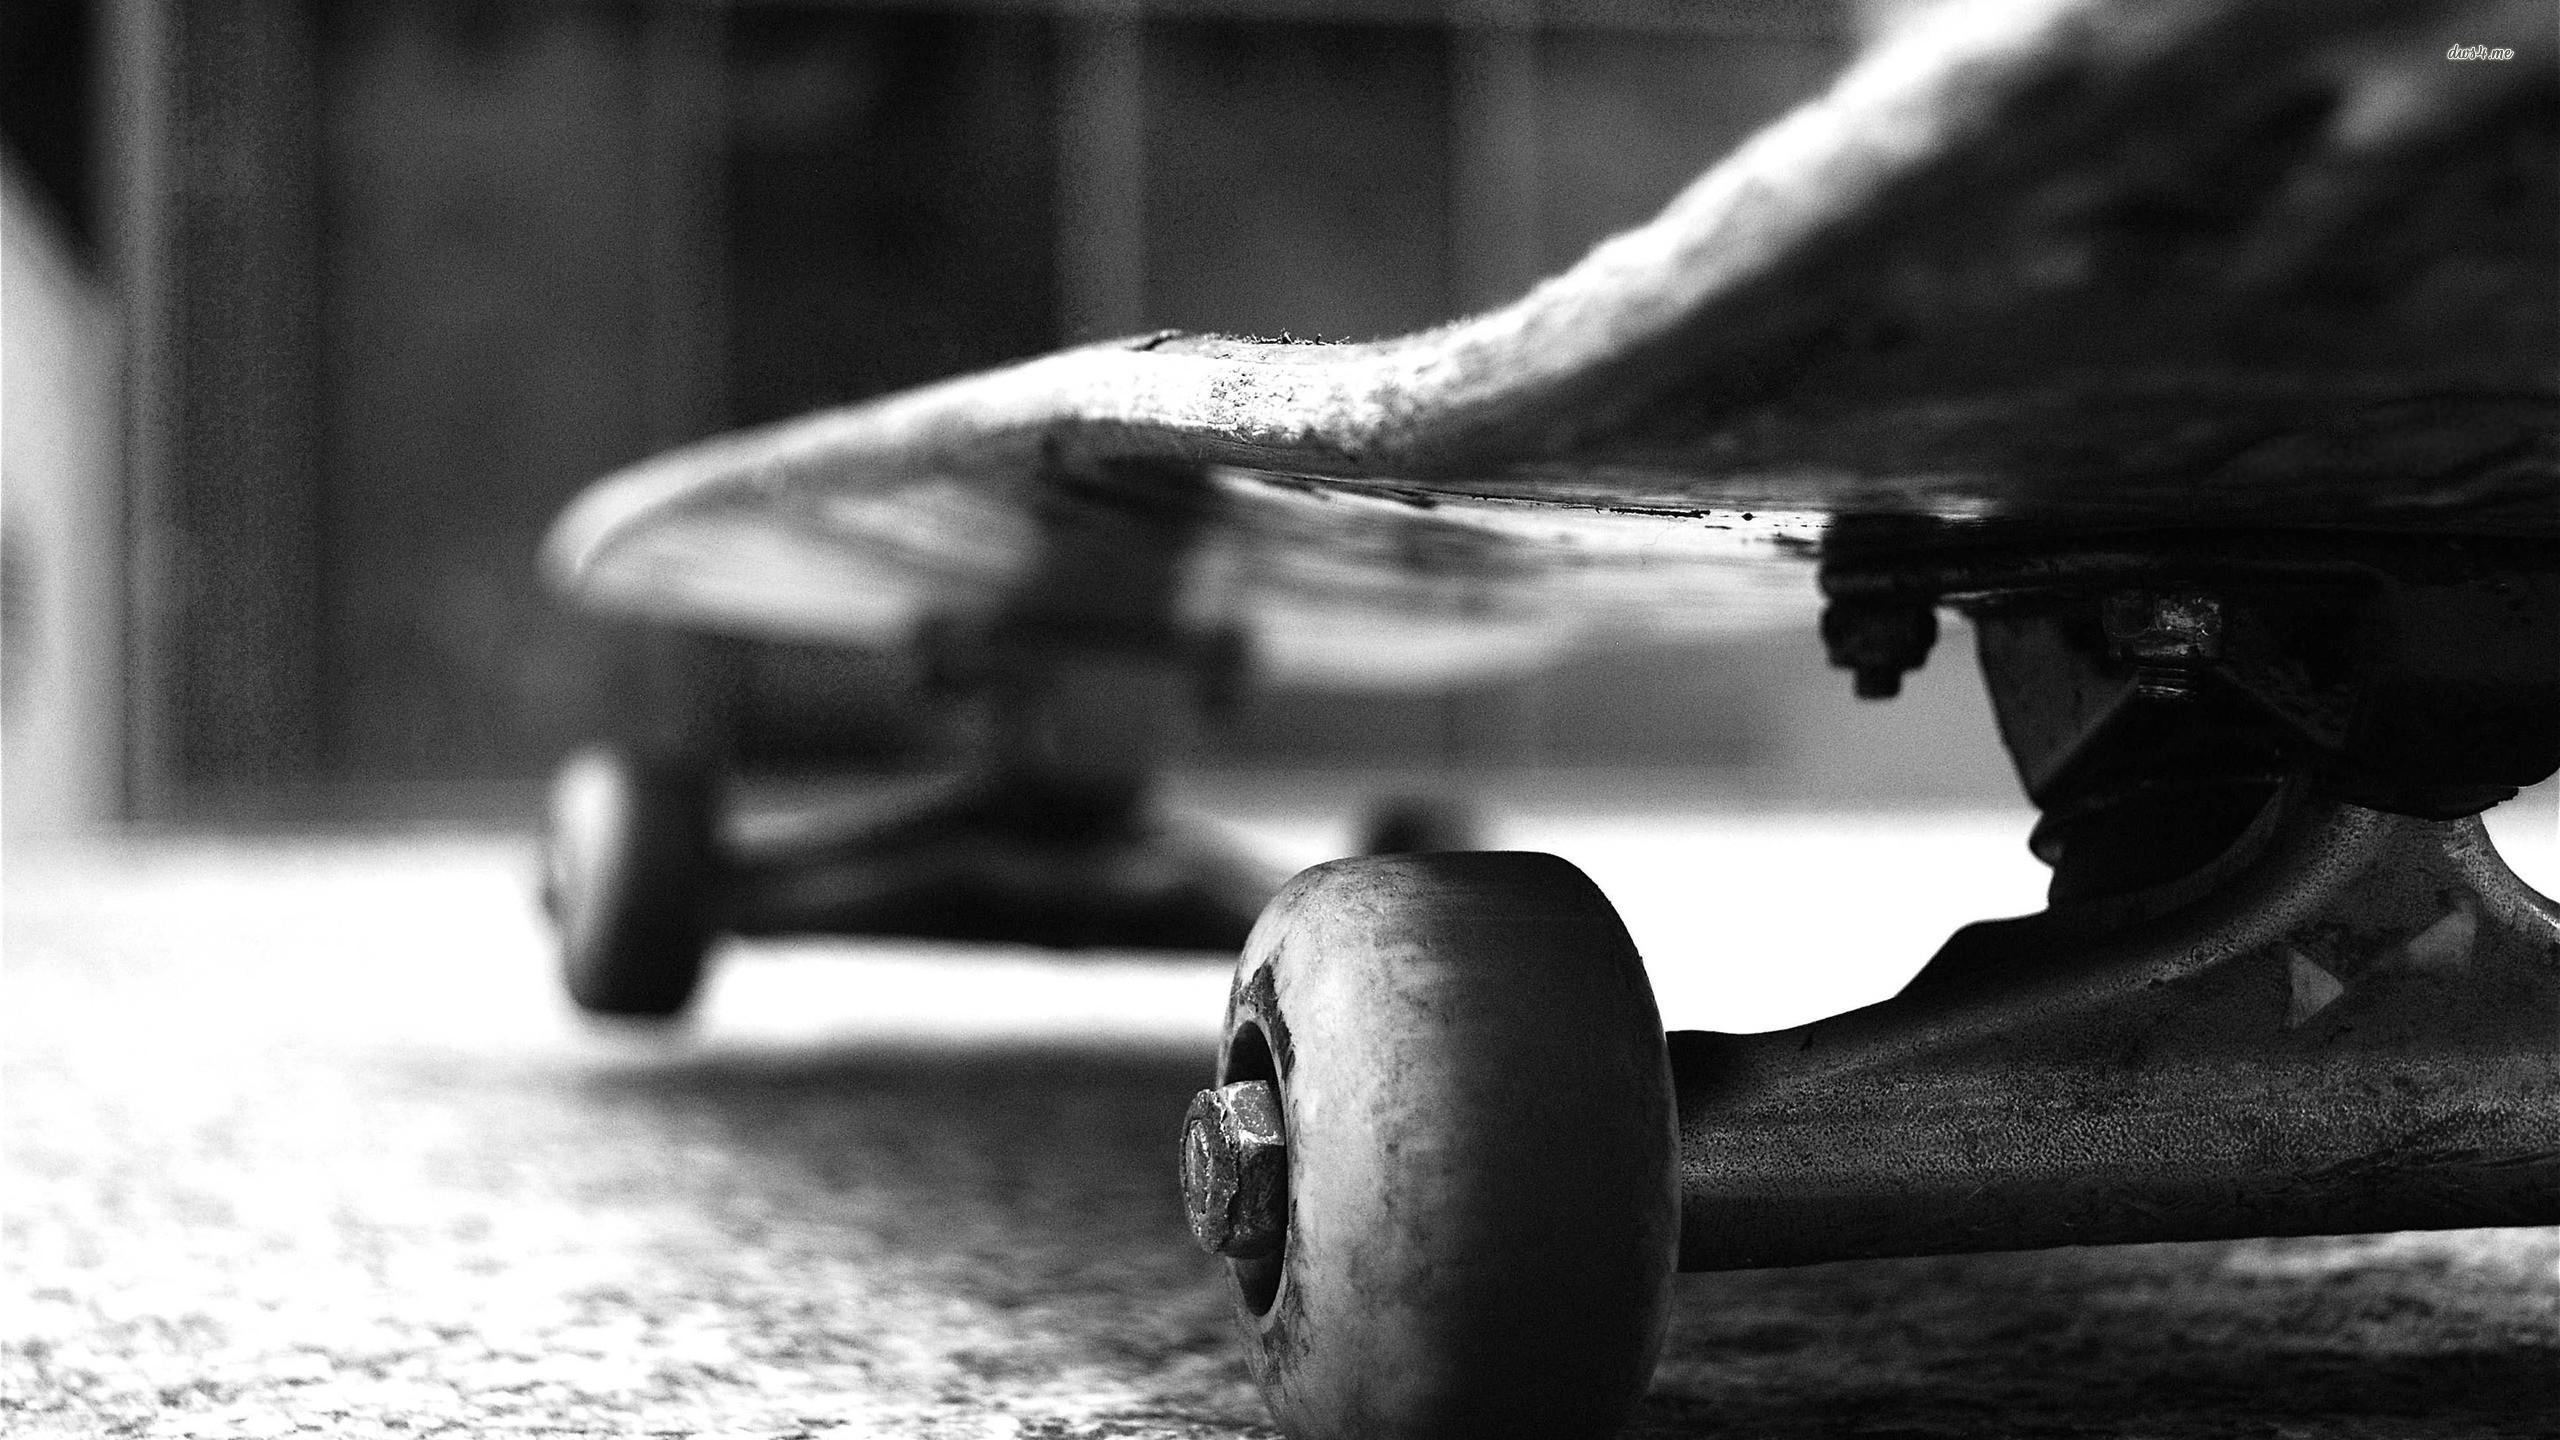 Wallpapers Skateboards Skateboard Photography 2560×1440